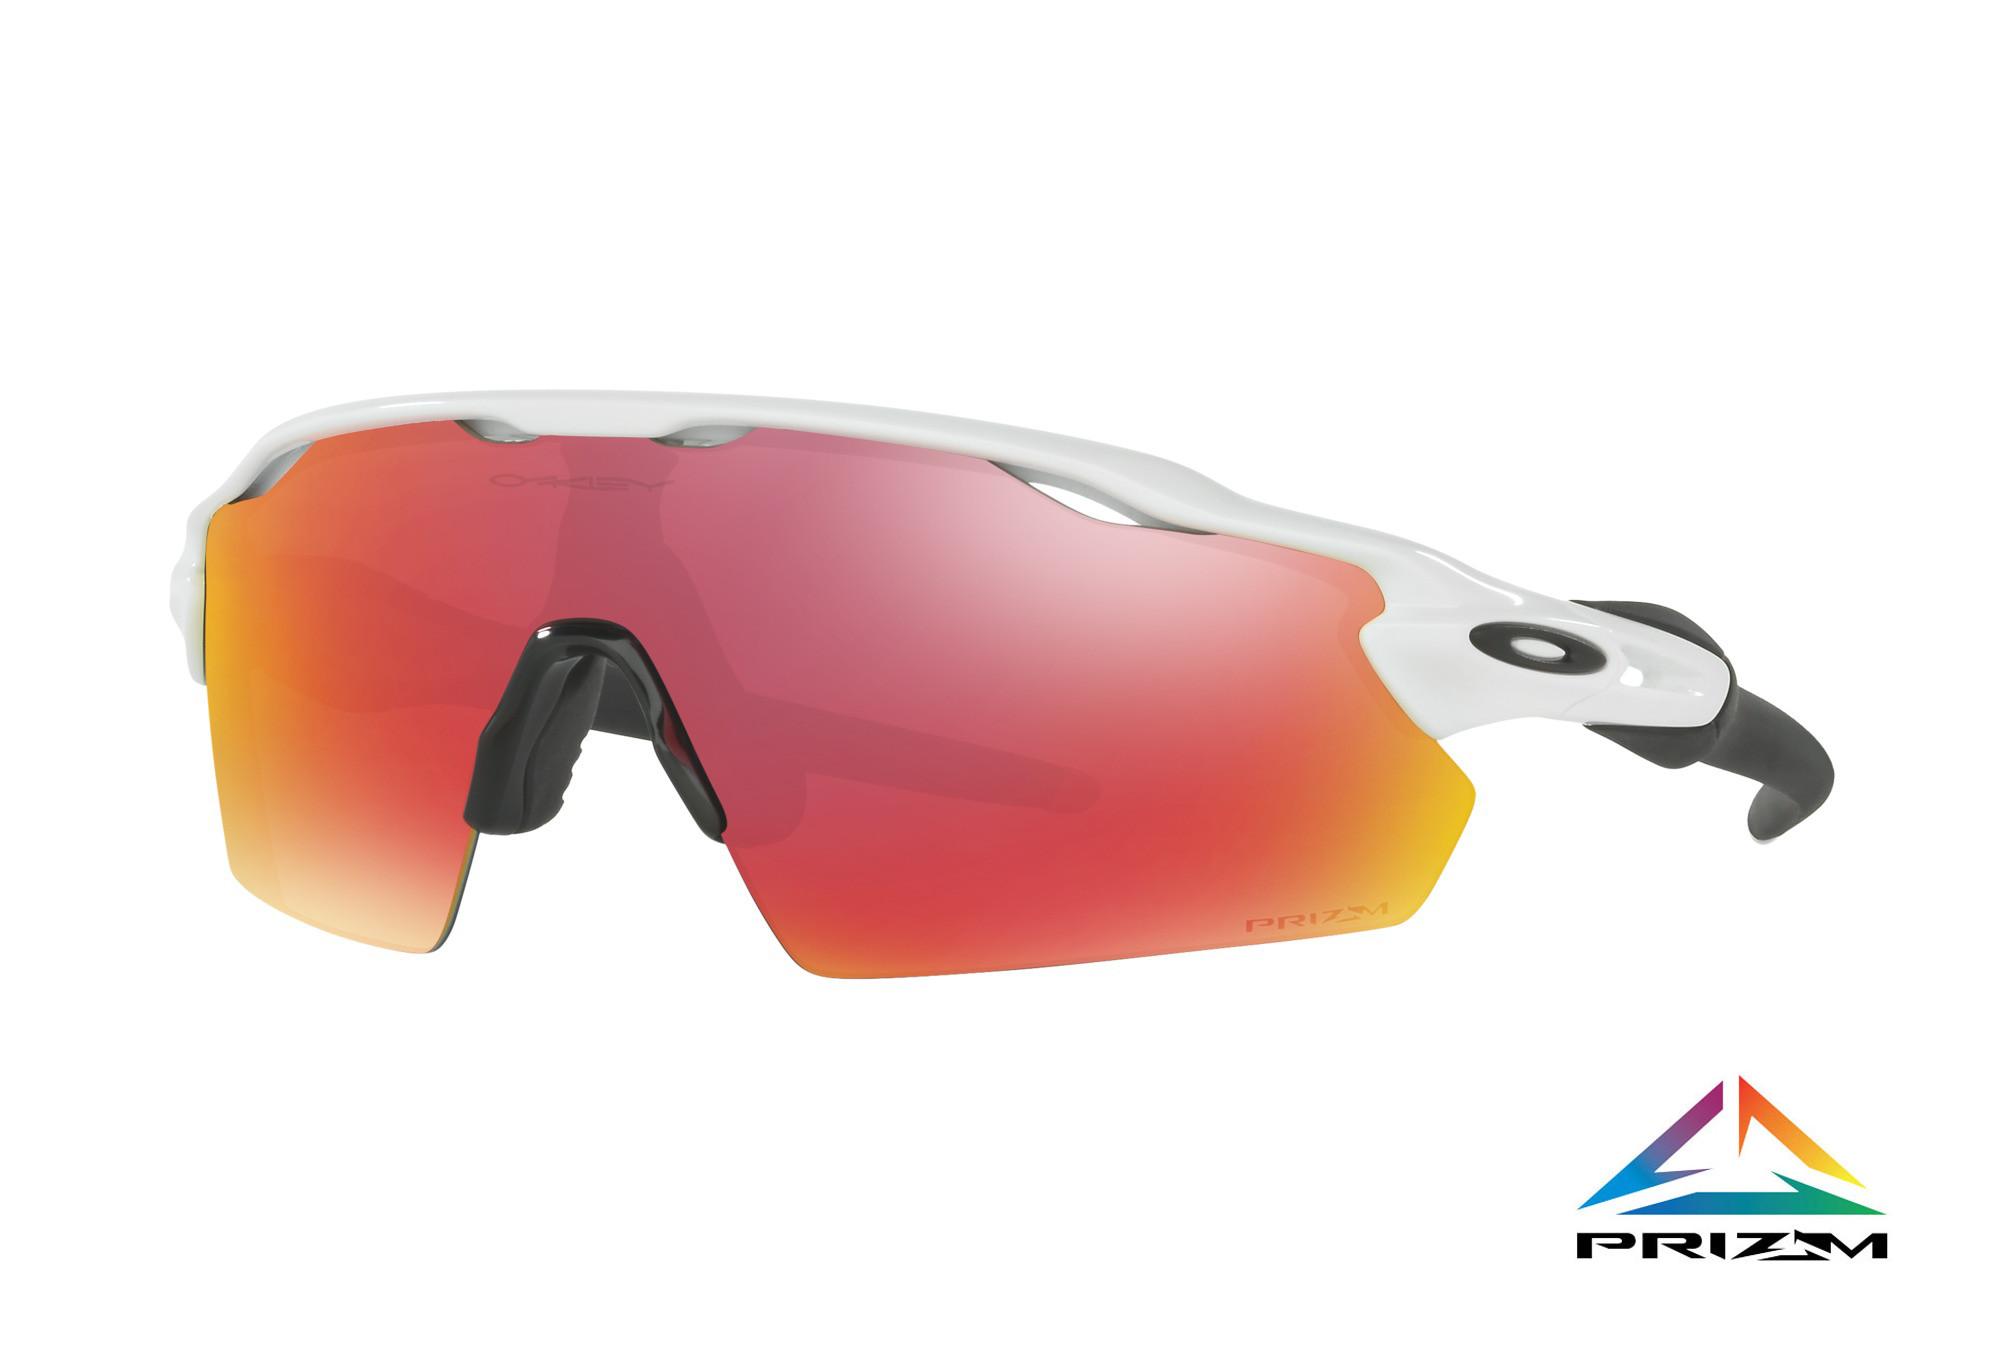 c4a76fab64 OAKLEY Sunglasses EV Pitch Polished White Black / Prizm Cricket Ref ...